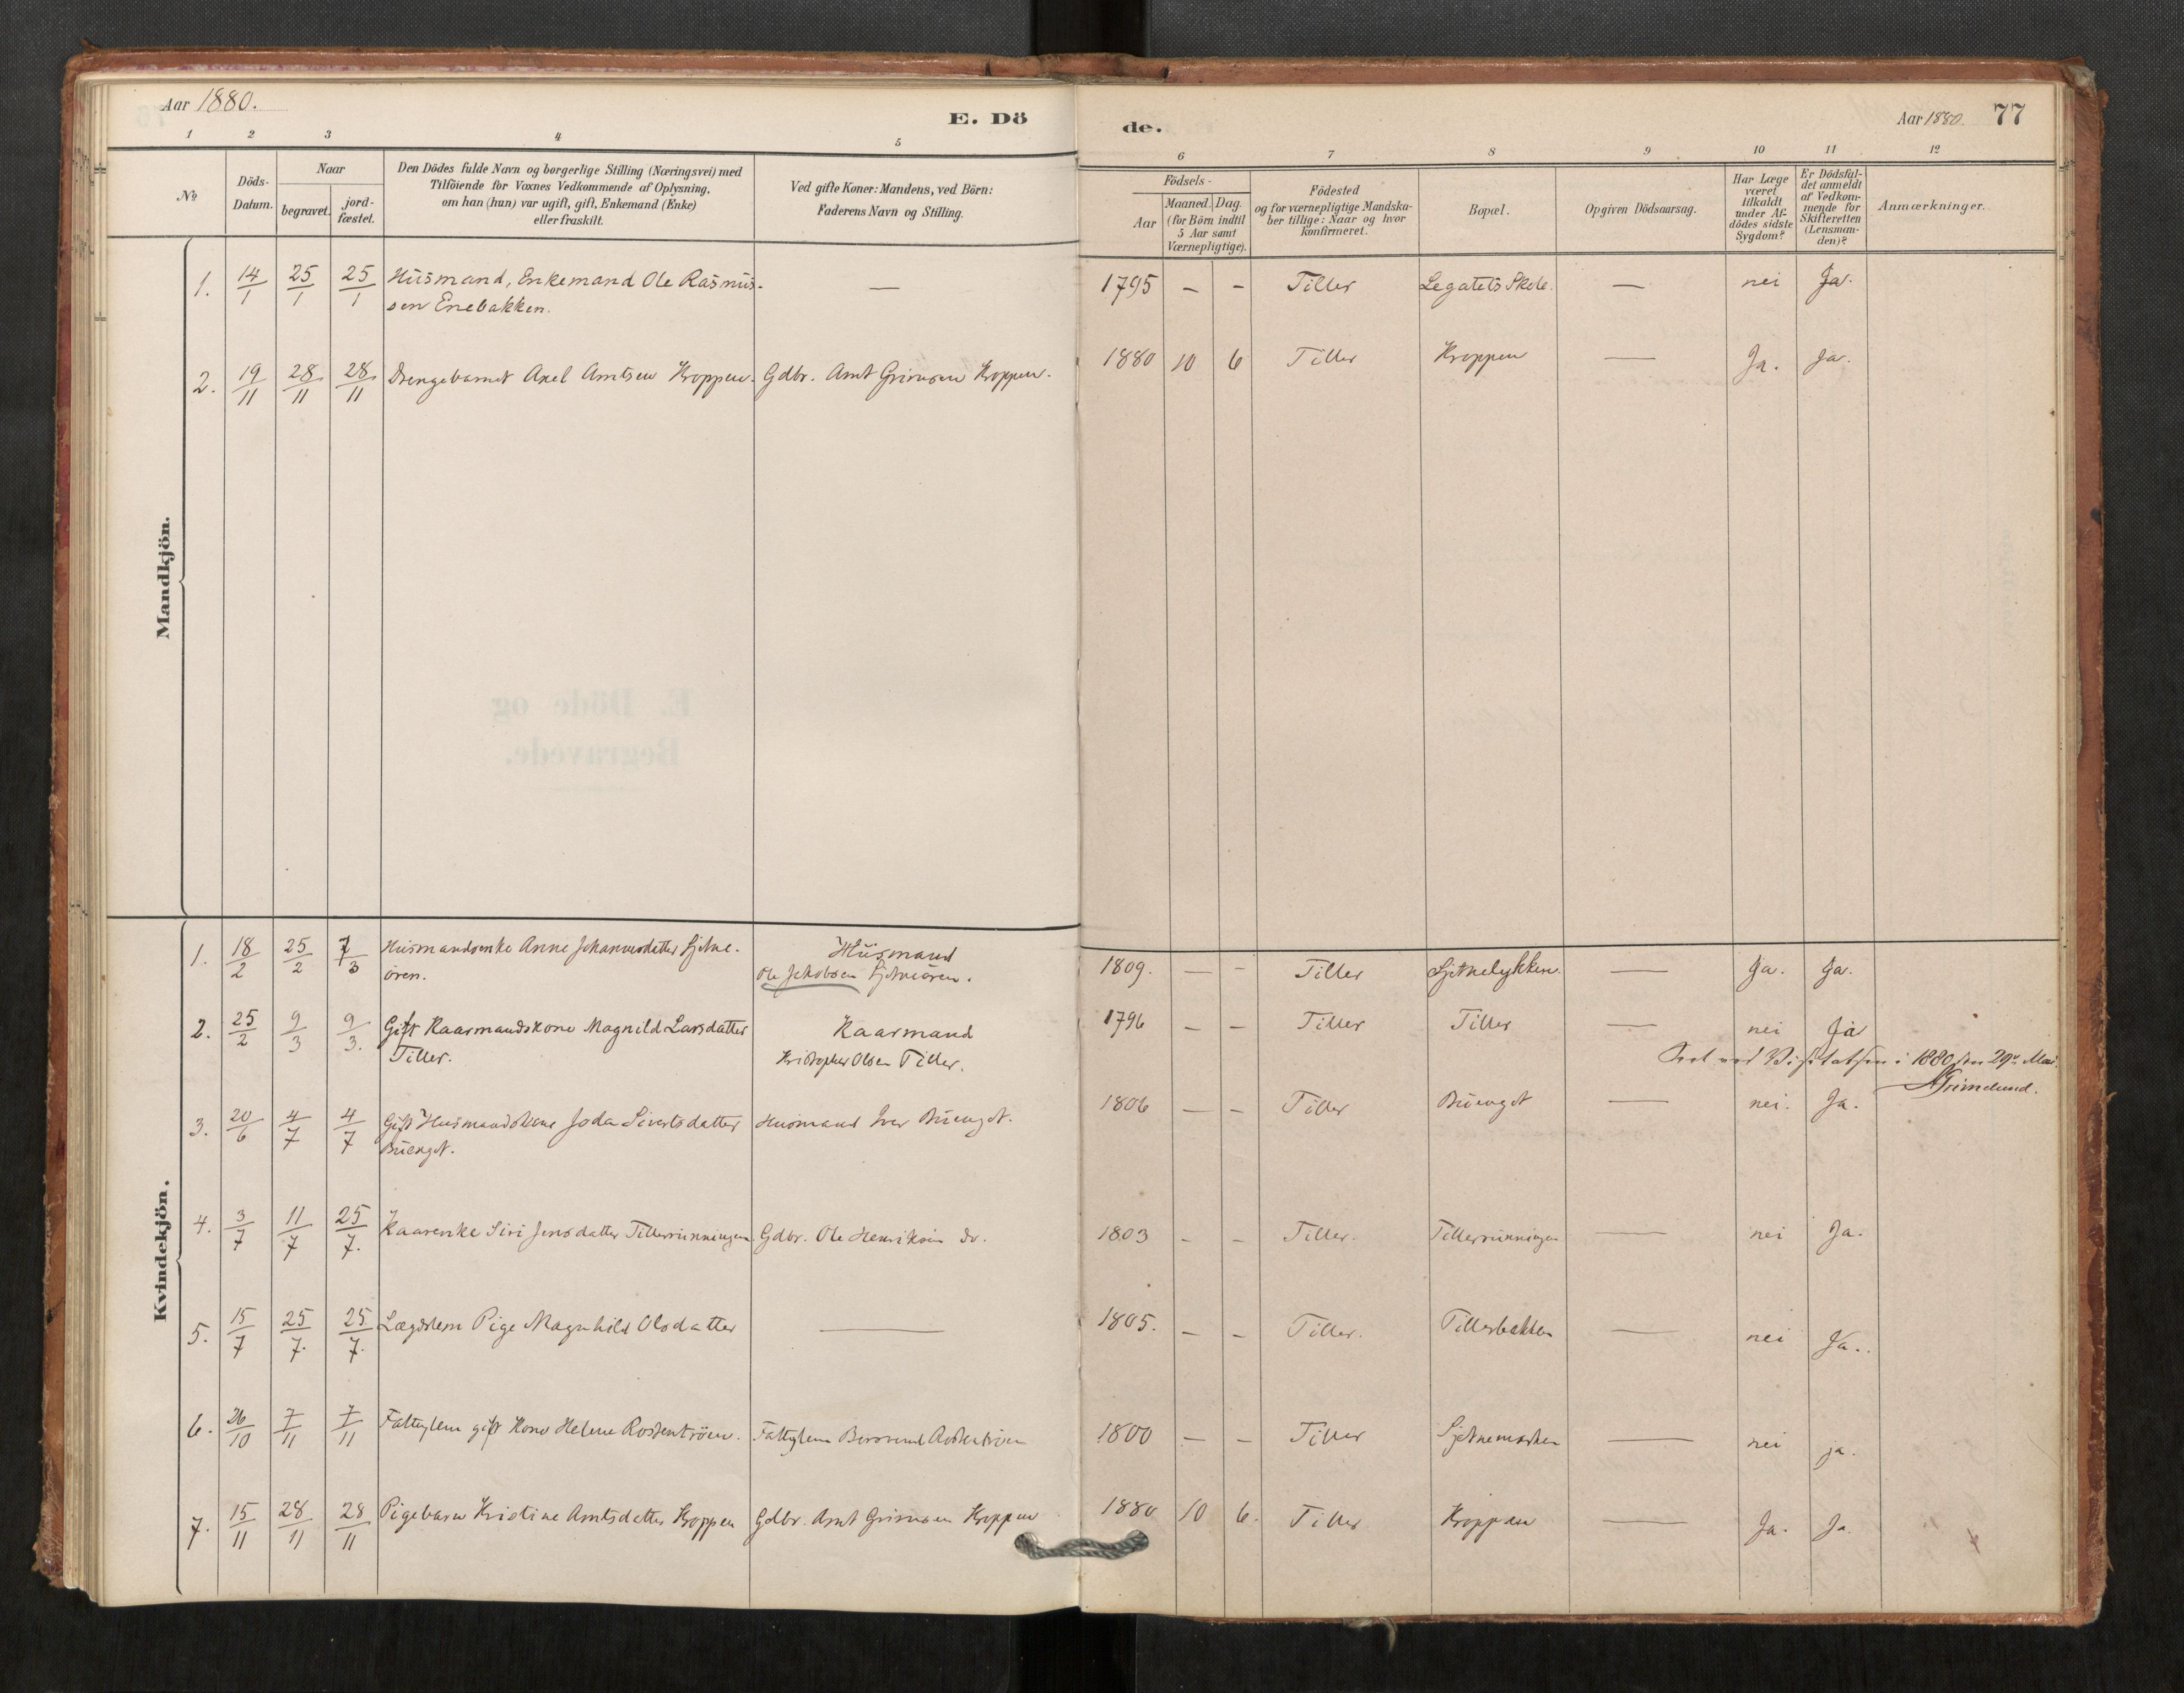 SAT, Klæbu sokneprestkontor, Ministerialbok nr. 1, 1880-1900, s. 77